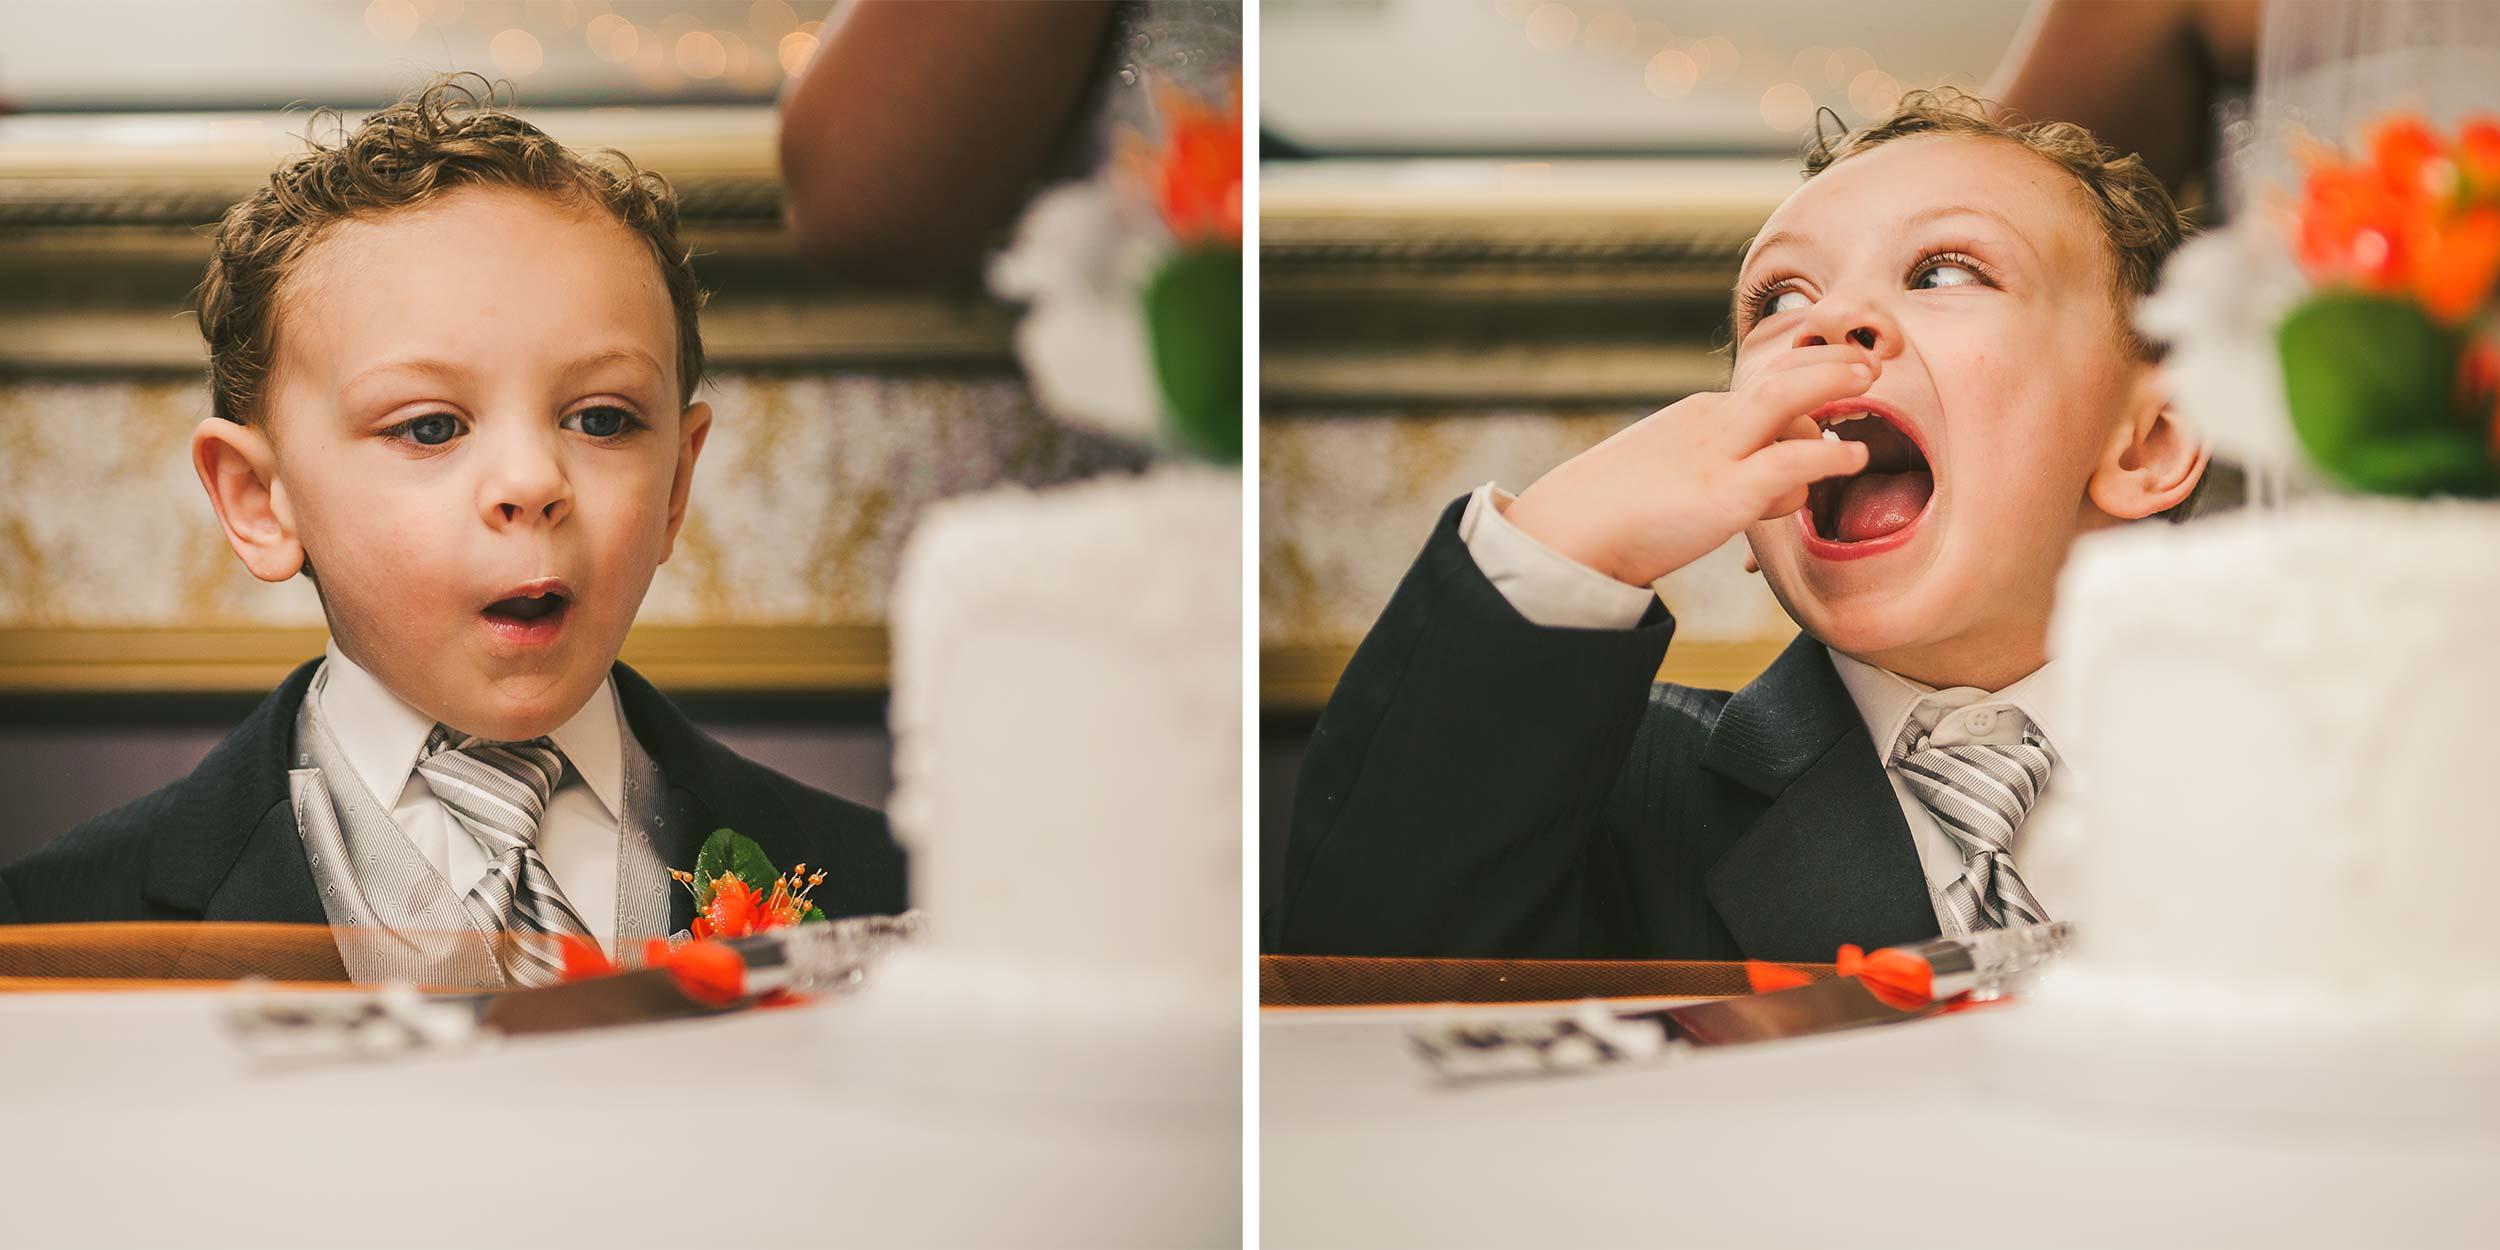 candid-wedding-reception-boy-staring-at-cake.jpg